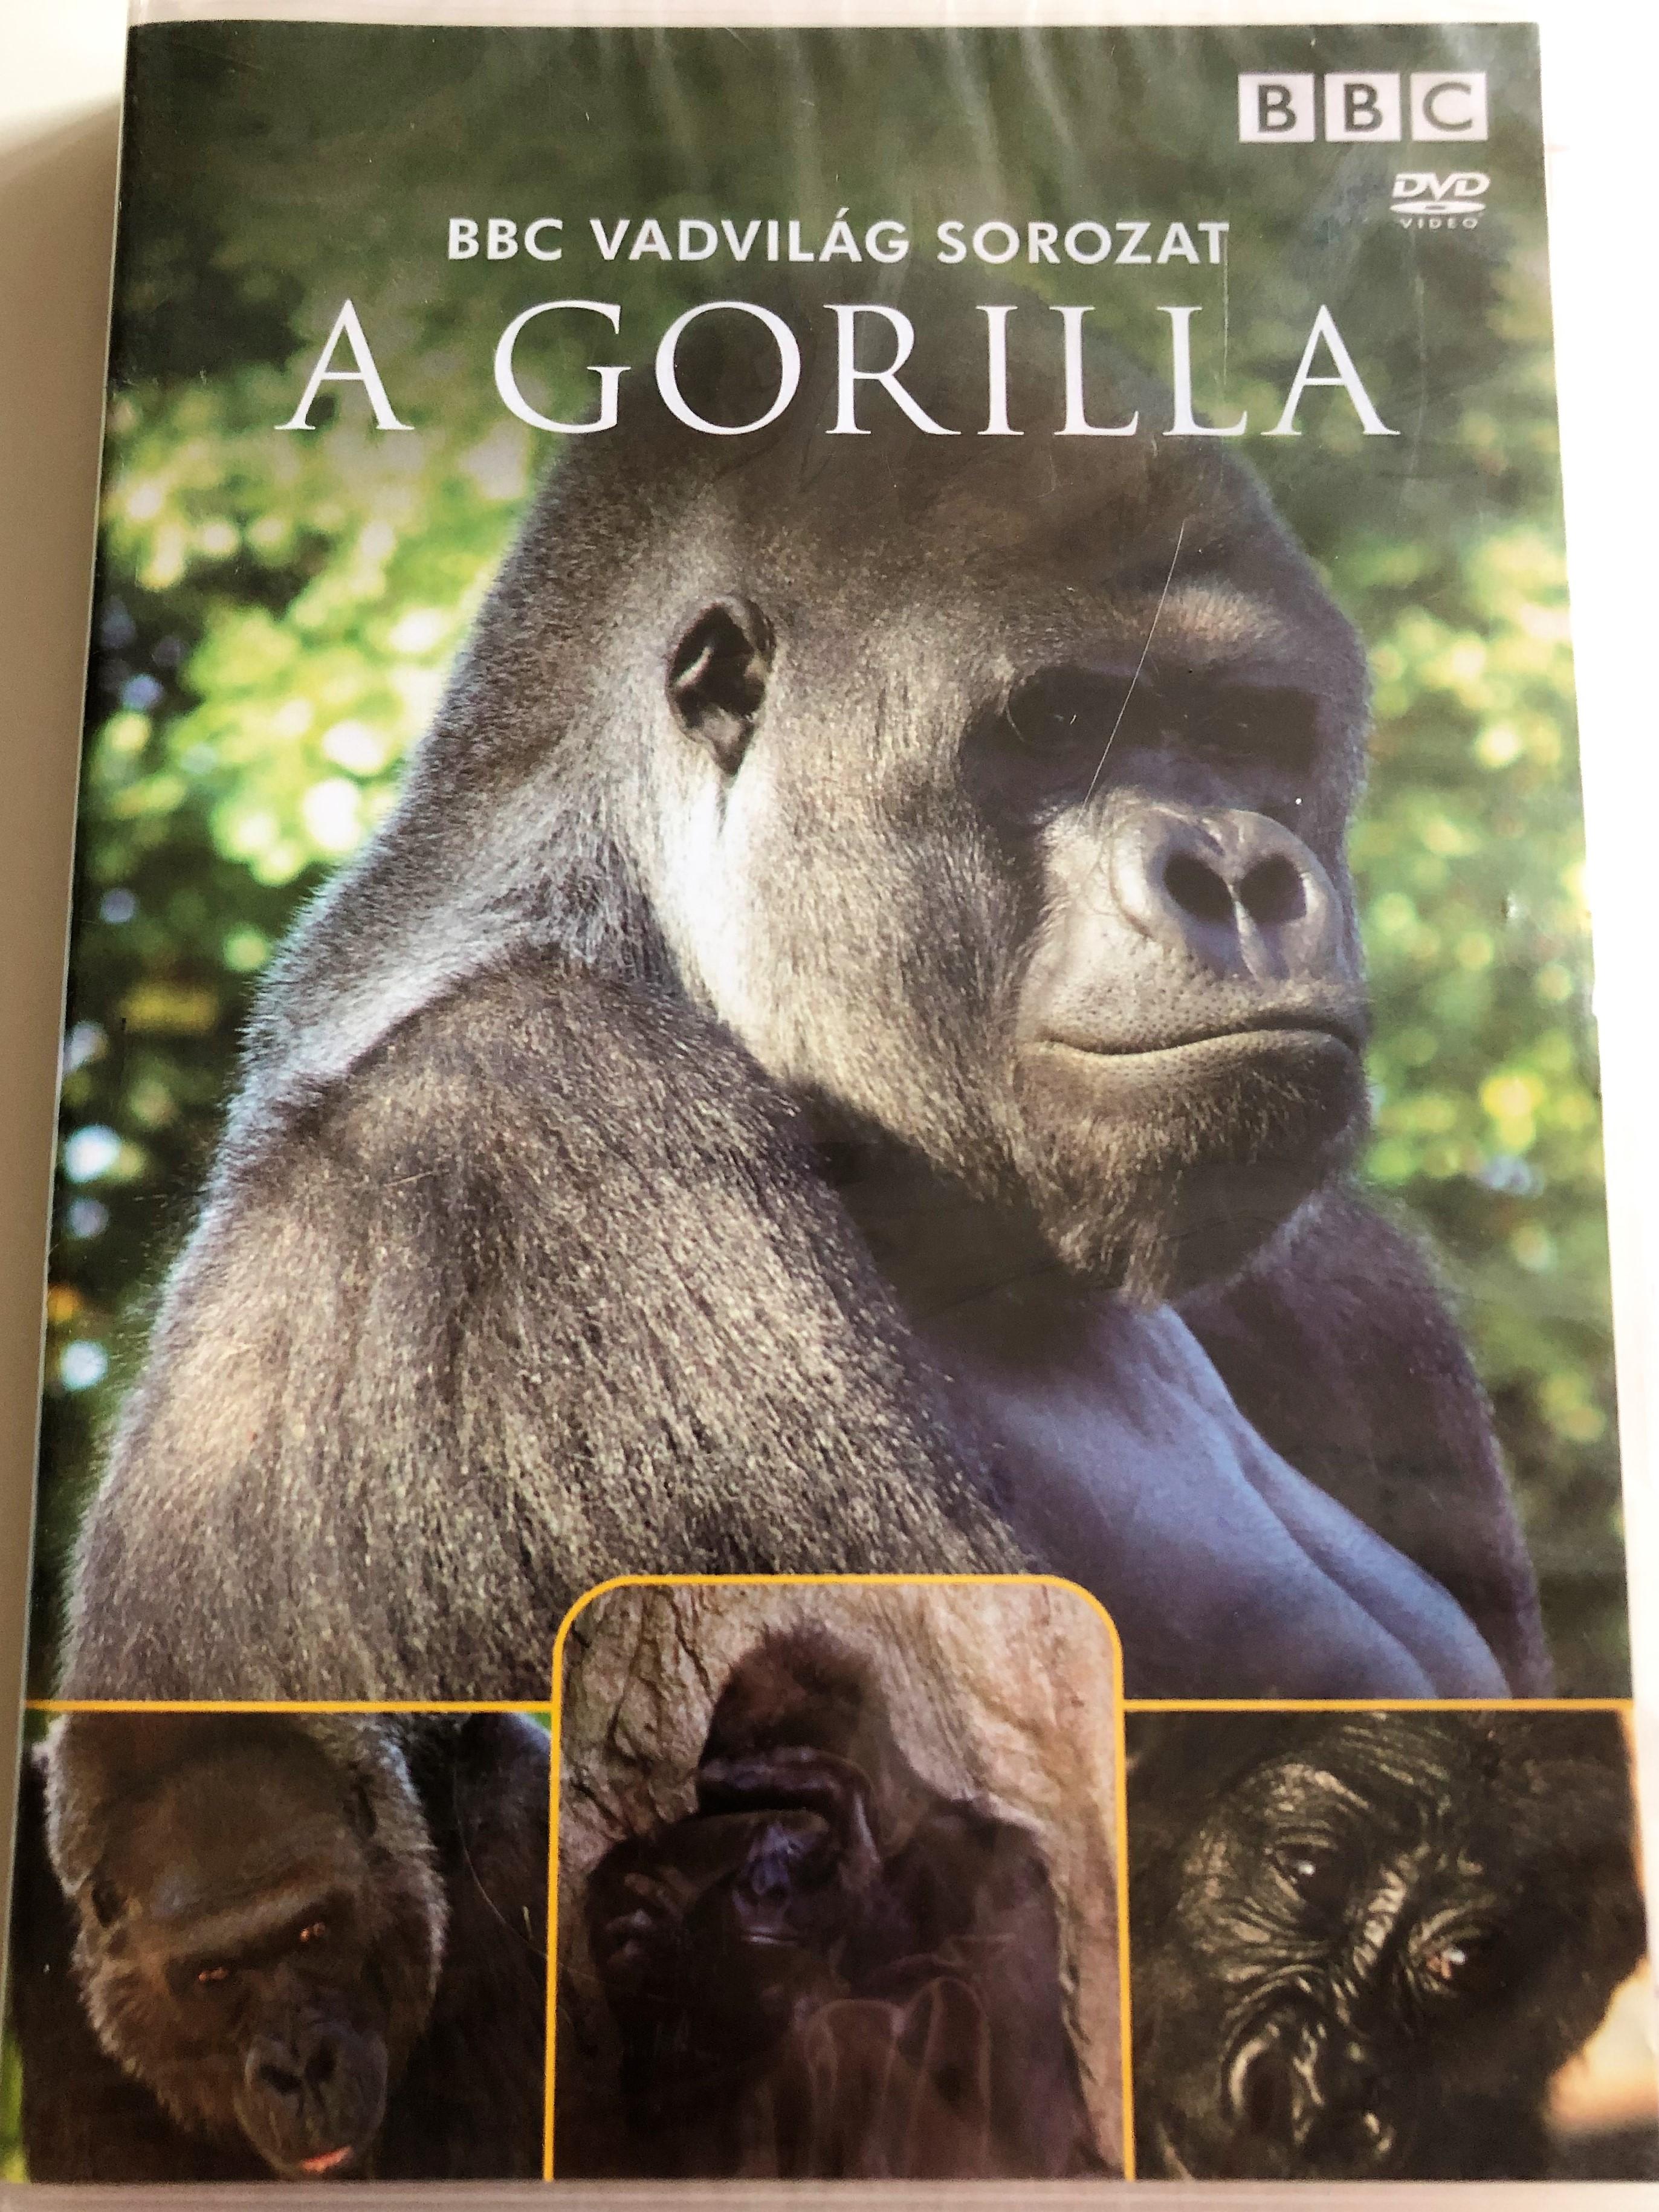 a-gorilla-gorillas-on-the-trail-of-king-kong-bbc-wildlife-series-narrated-by-sir-david-attenborough-dvd-2002-bbc-vadvil-g-sorozat-1-.jpg